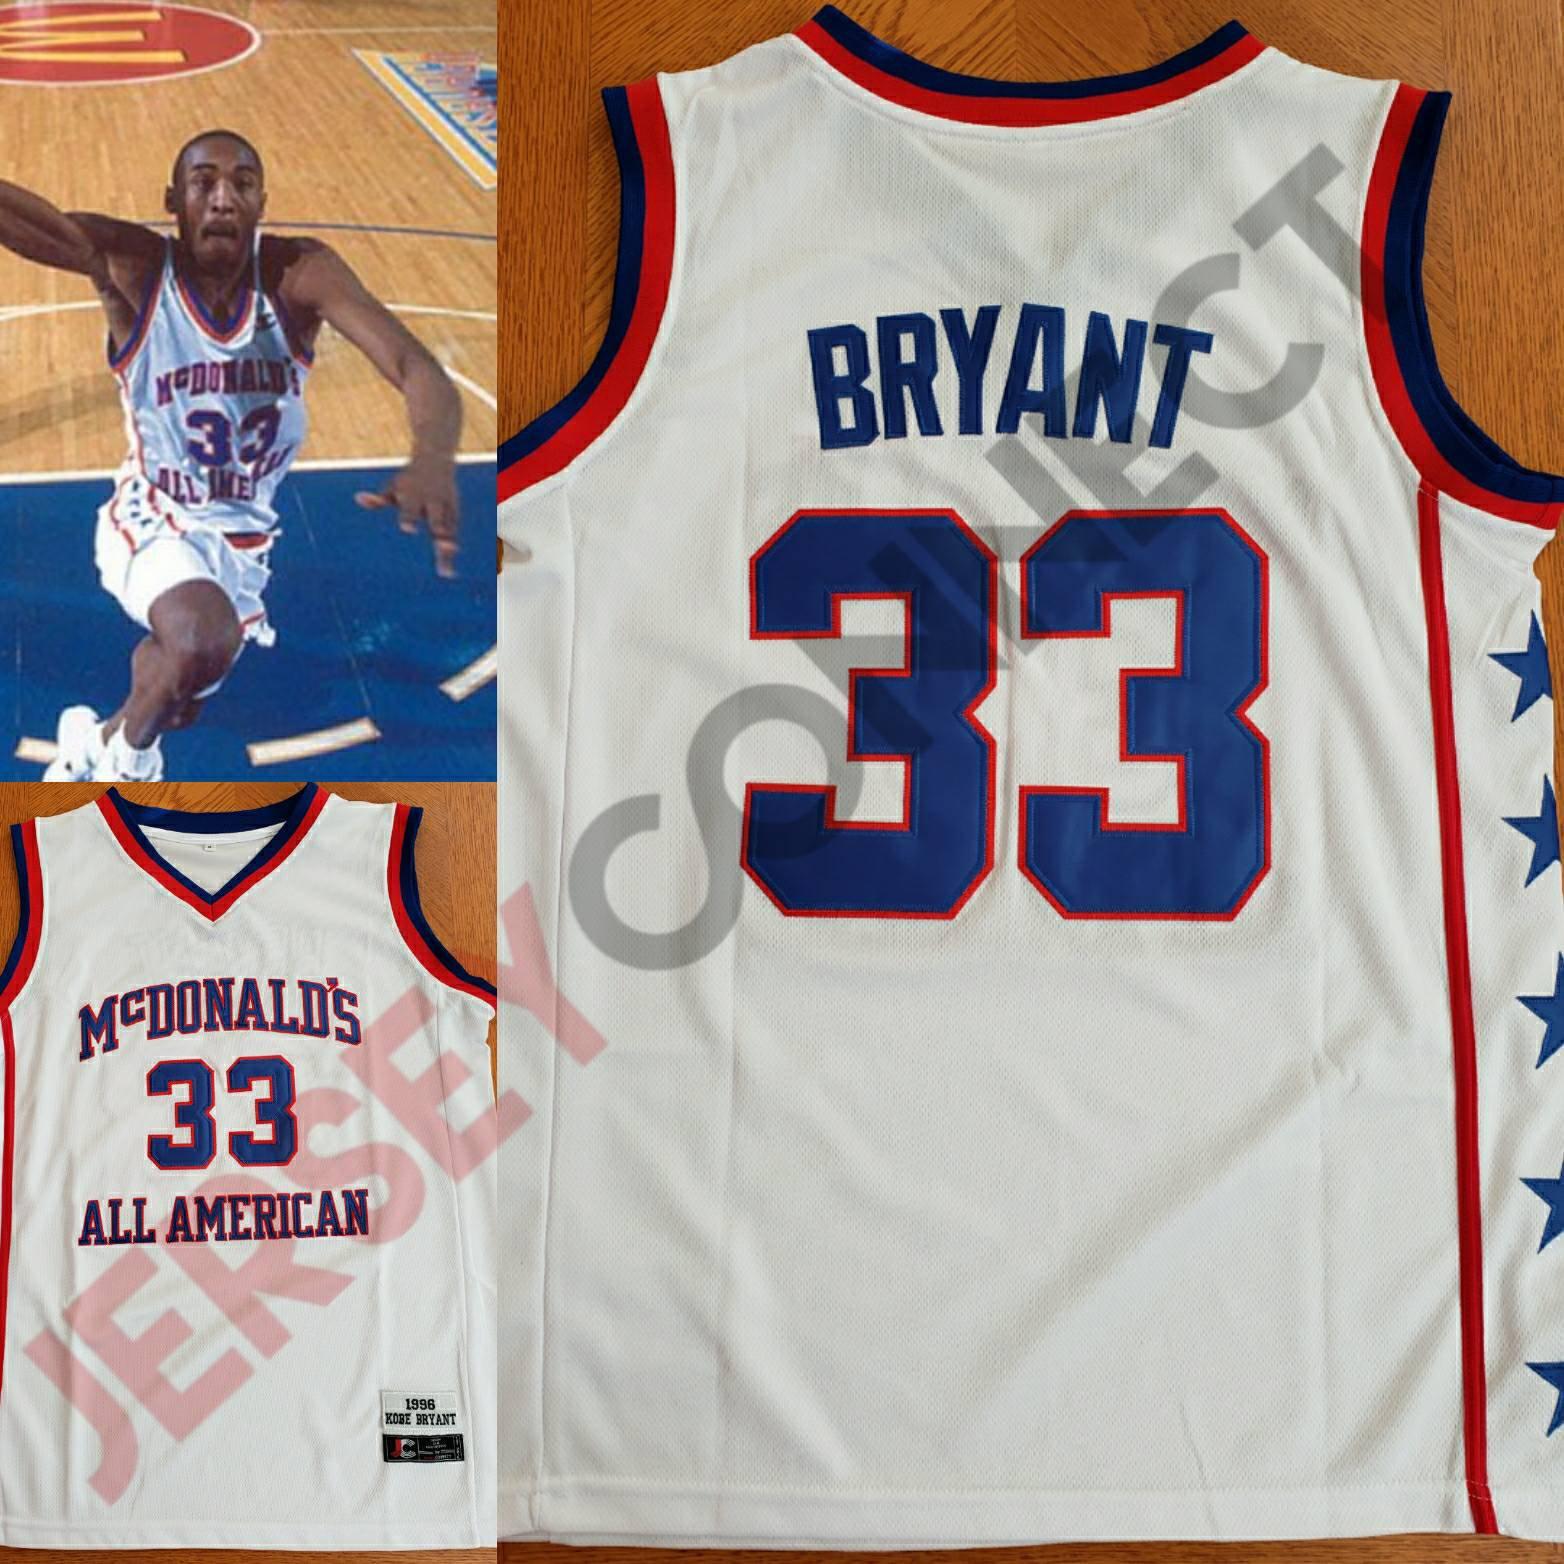 New Kobe Bryant McDonald's All American Basketball Jersey (S,M,L,XL,2XL)